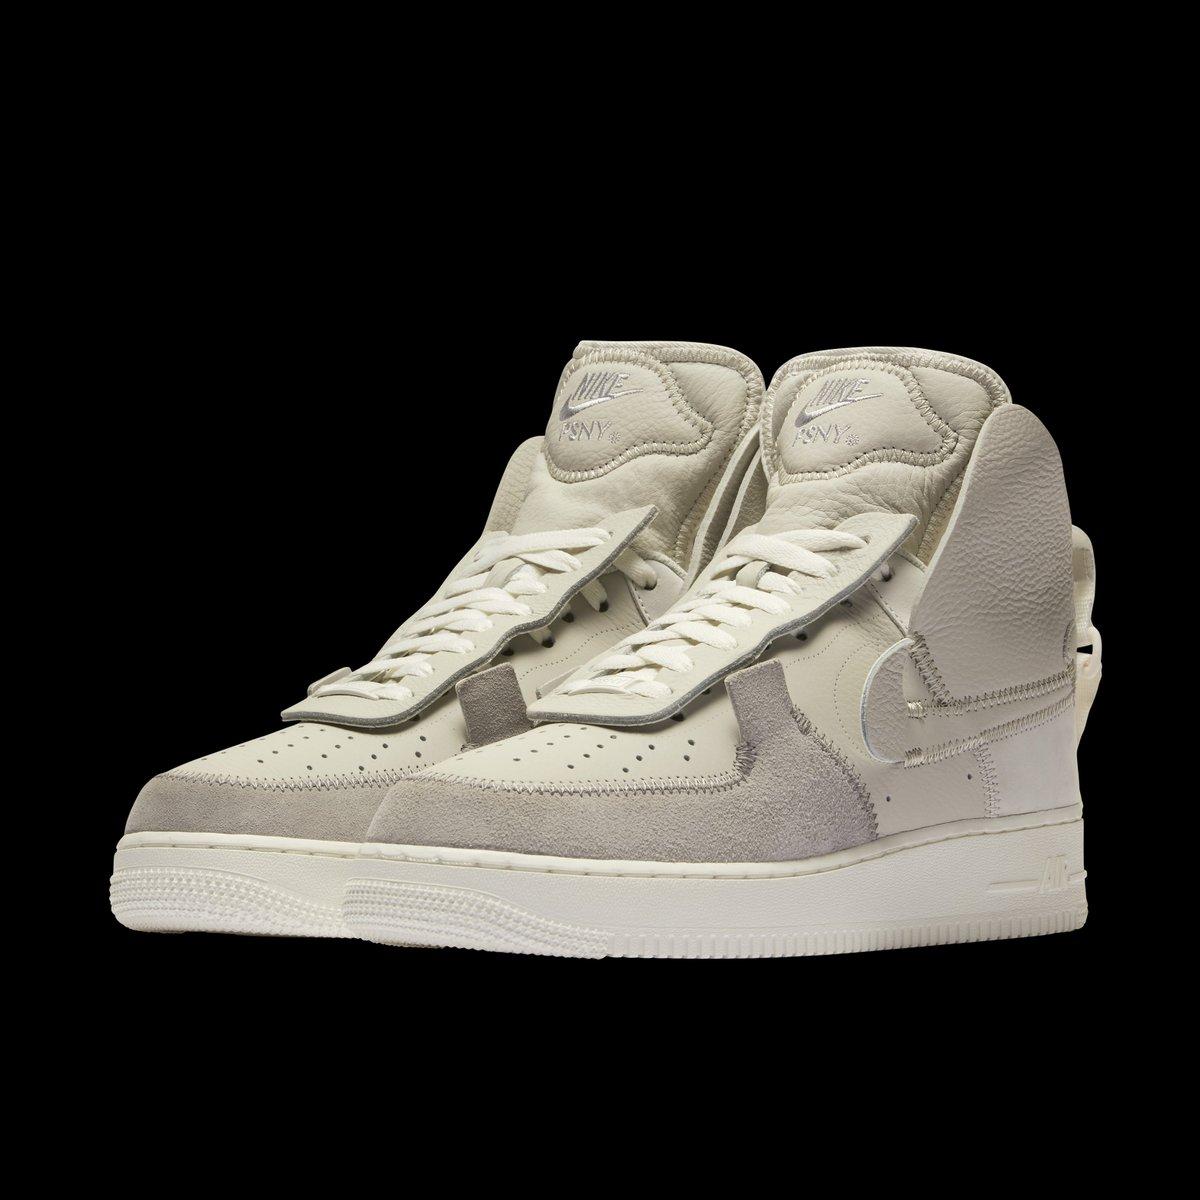 online store 12f3b ce61e Lust México presenta  Public School x Nike  AF1 High. Conoce la dinámica de  registro y venta en este link  http   bit.ly af1psny  TeamLust ...